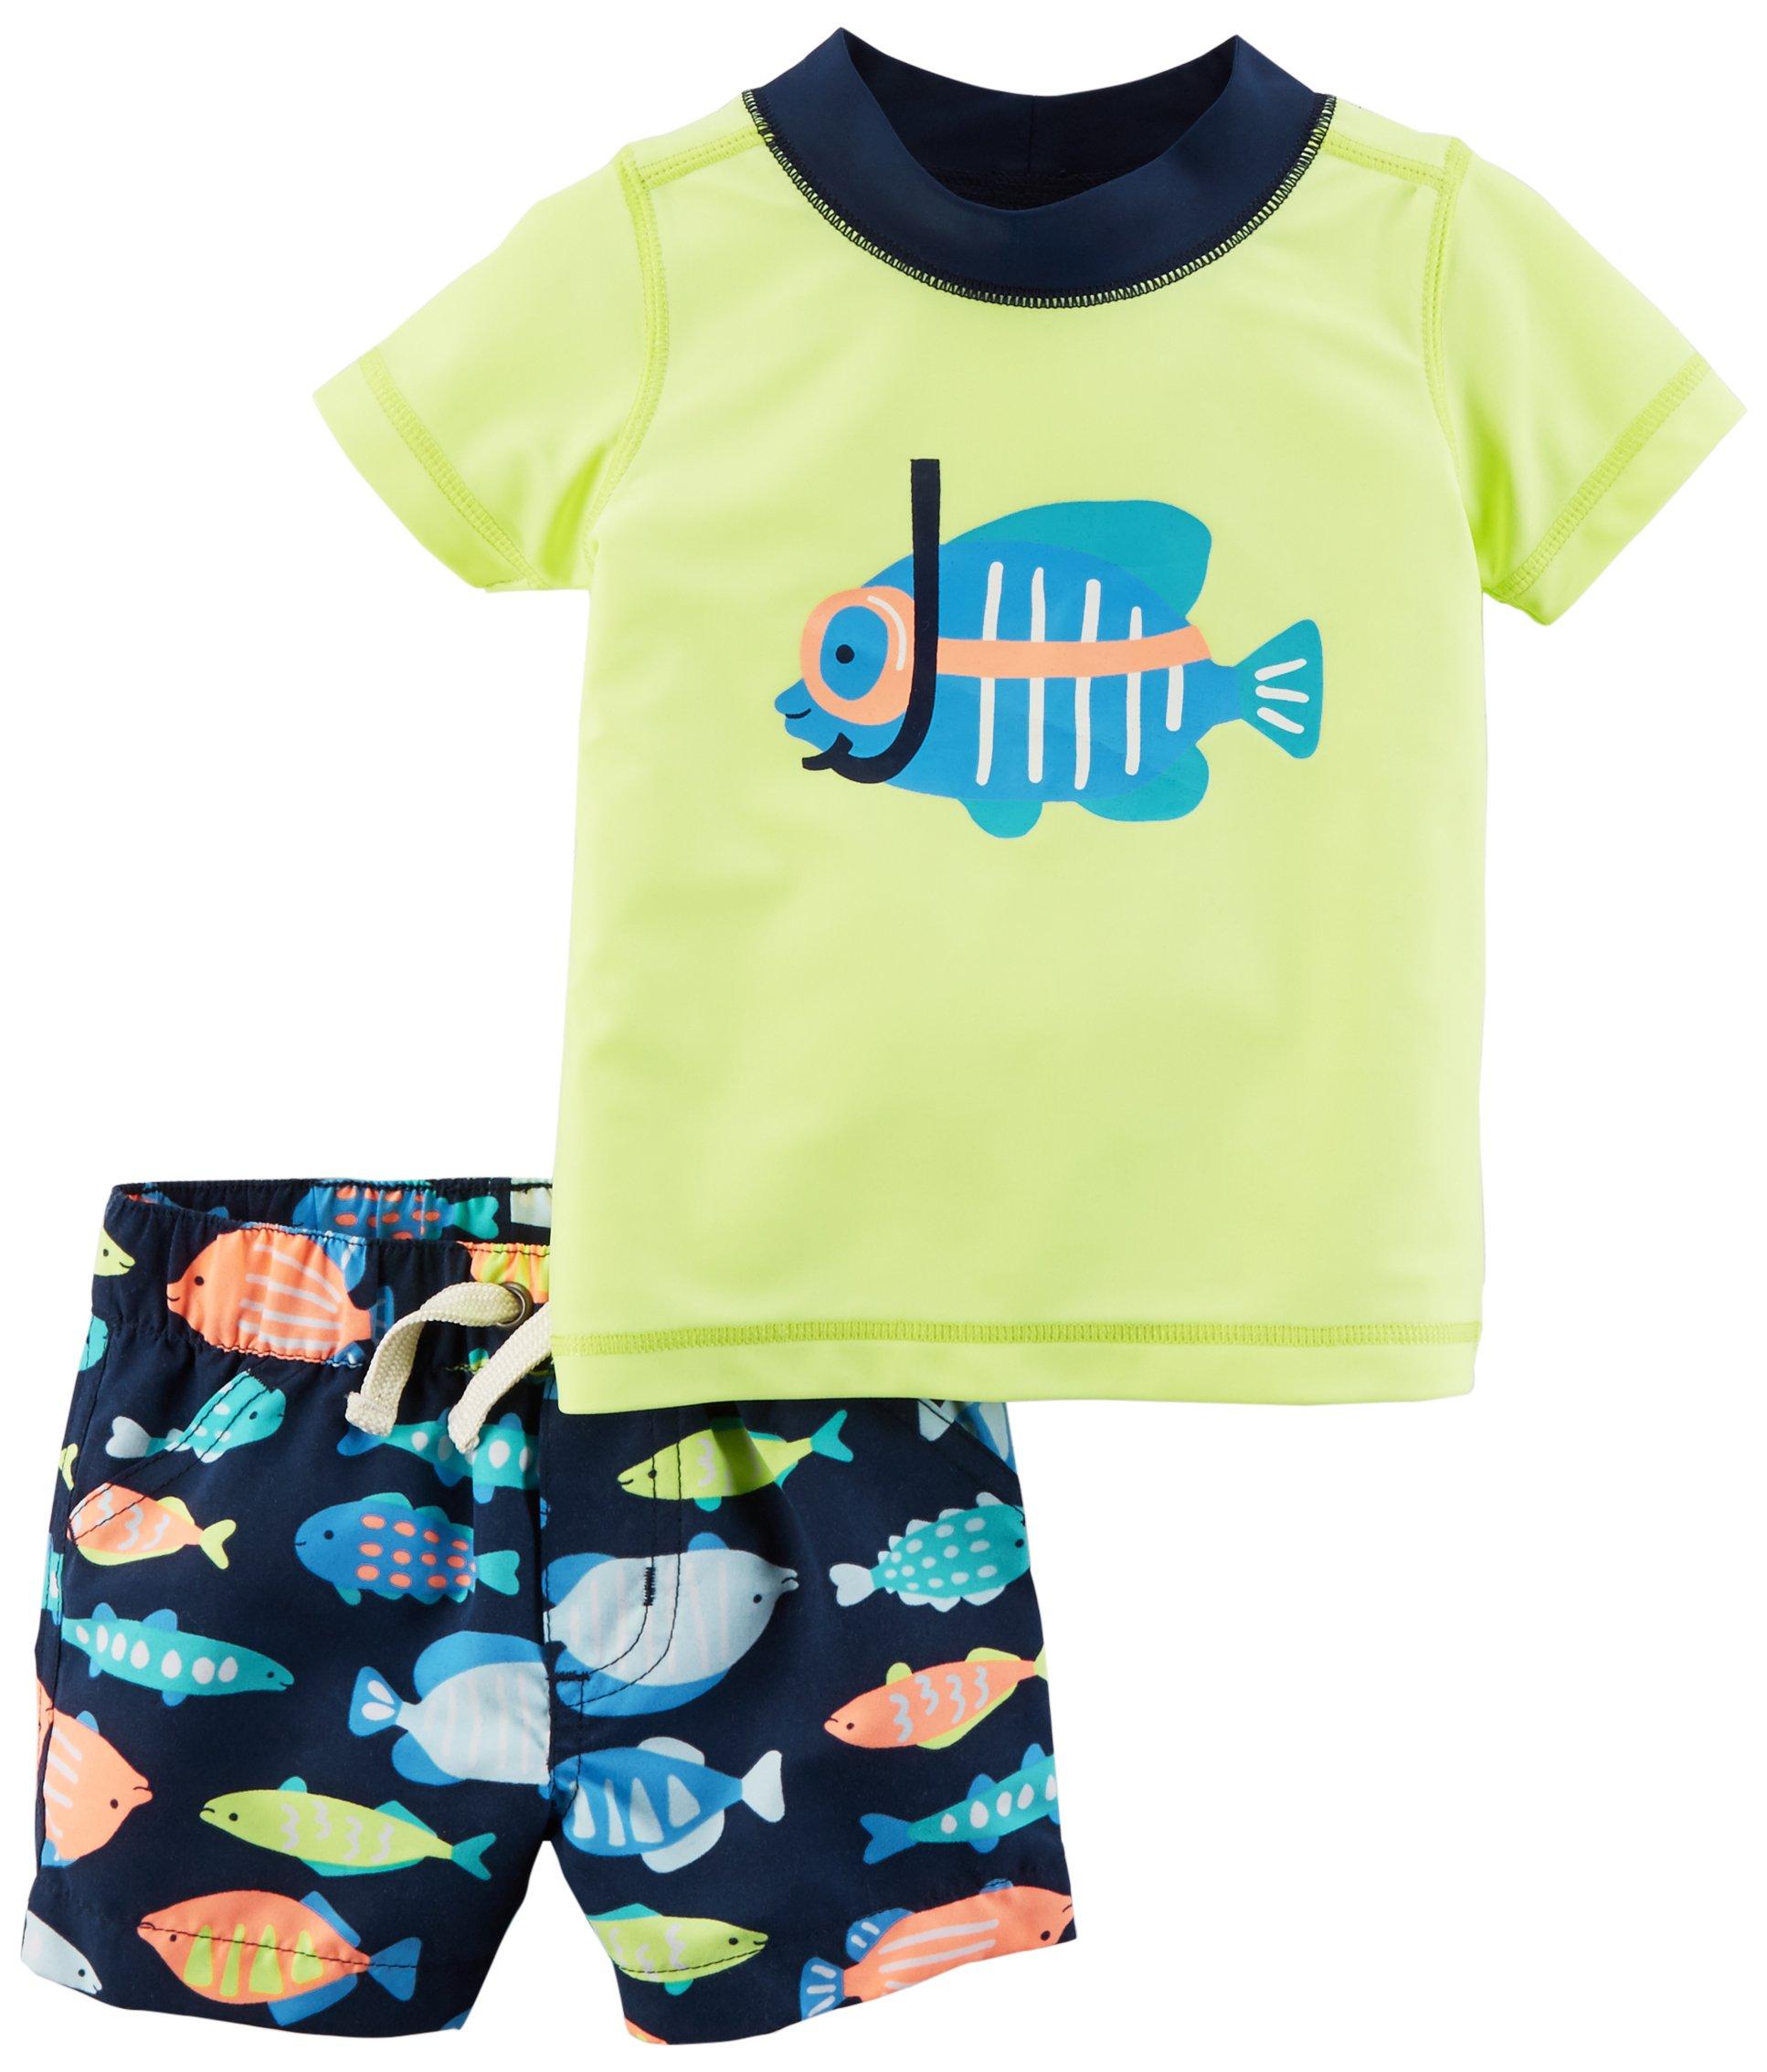 Carter's Boys' Rashguard Swim Set, Yellow Fish, 9